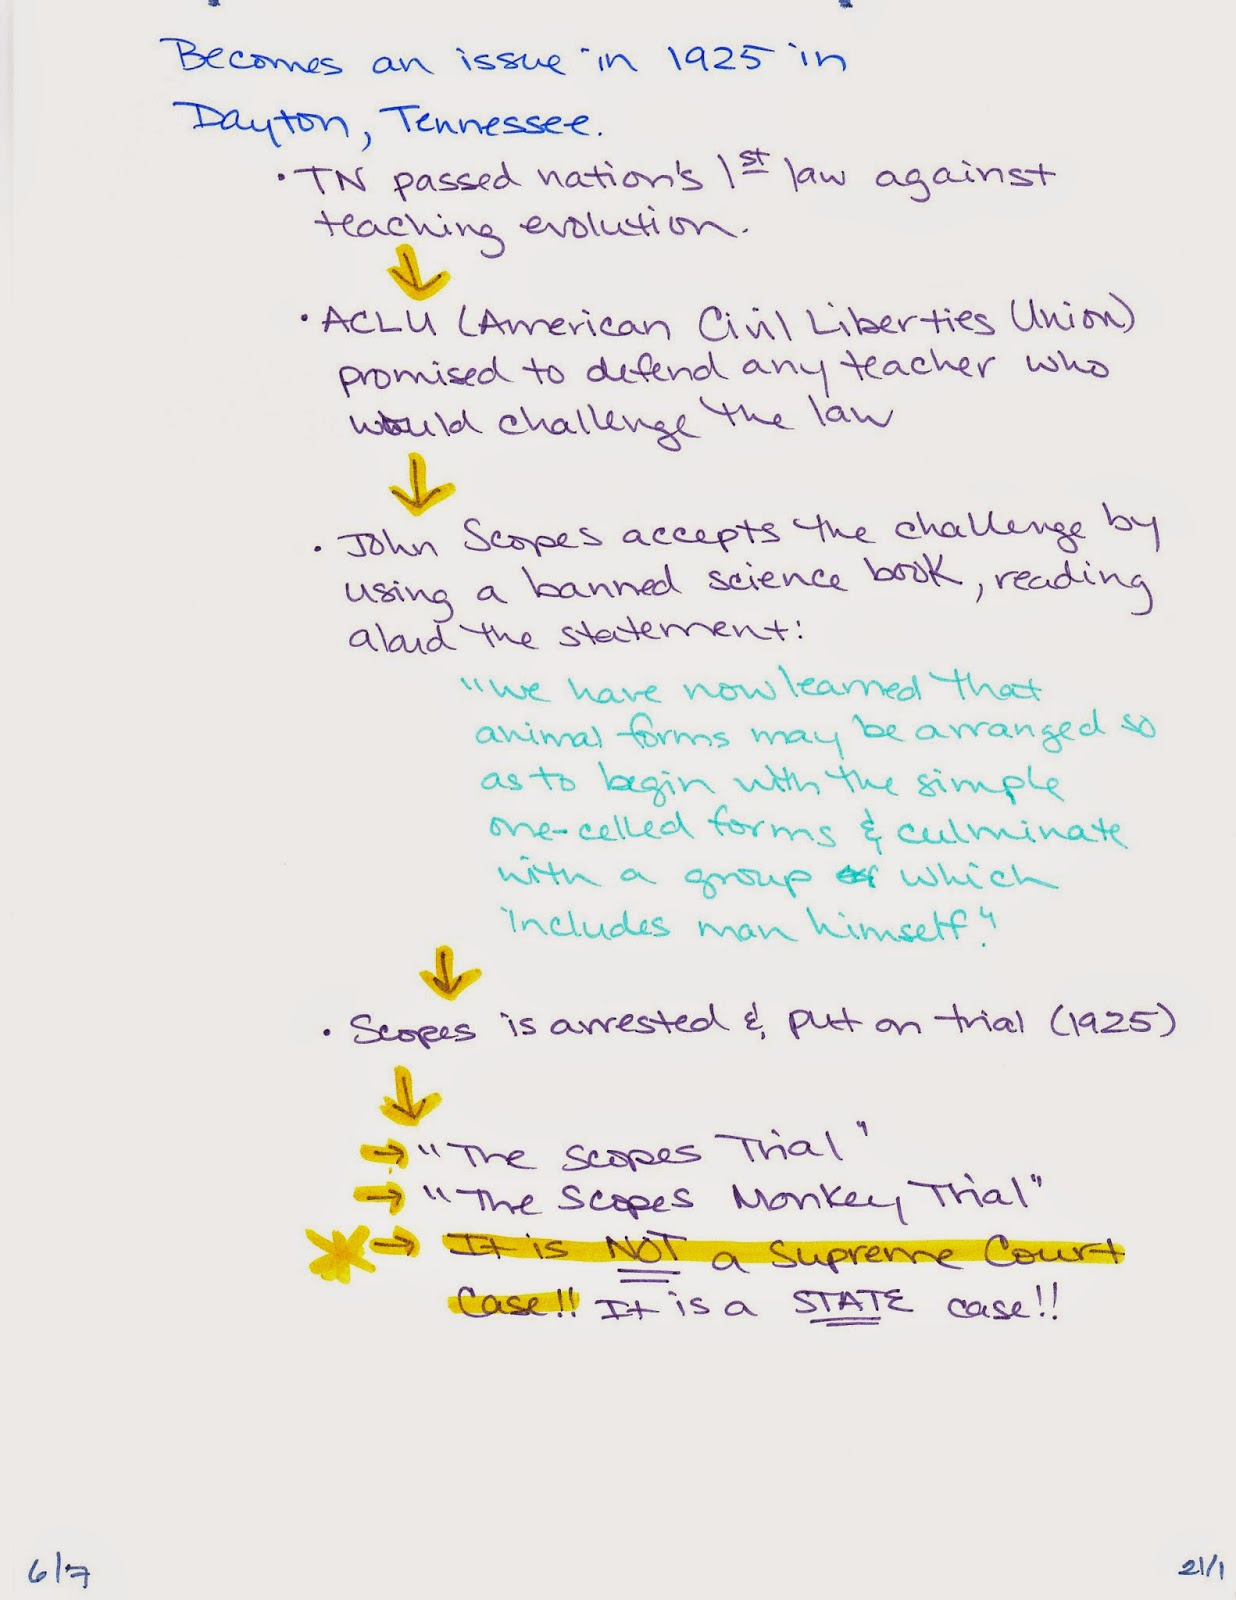 Us history chapter 21 notes - Homework Sample